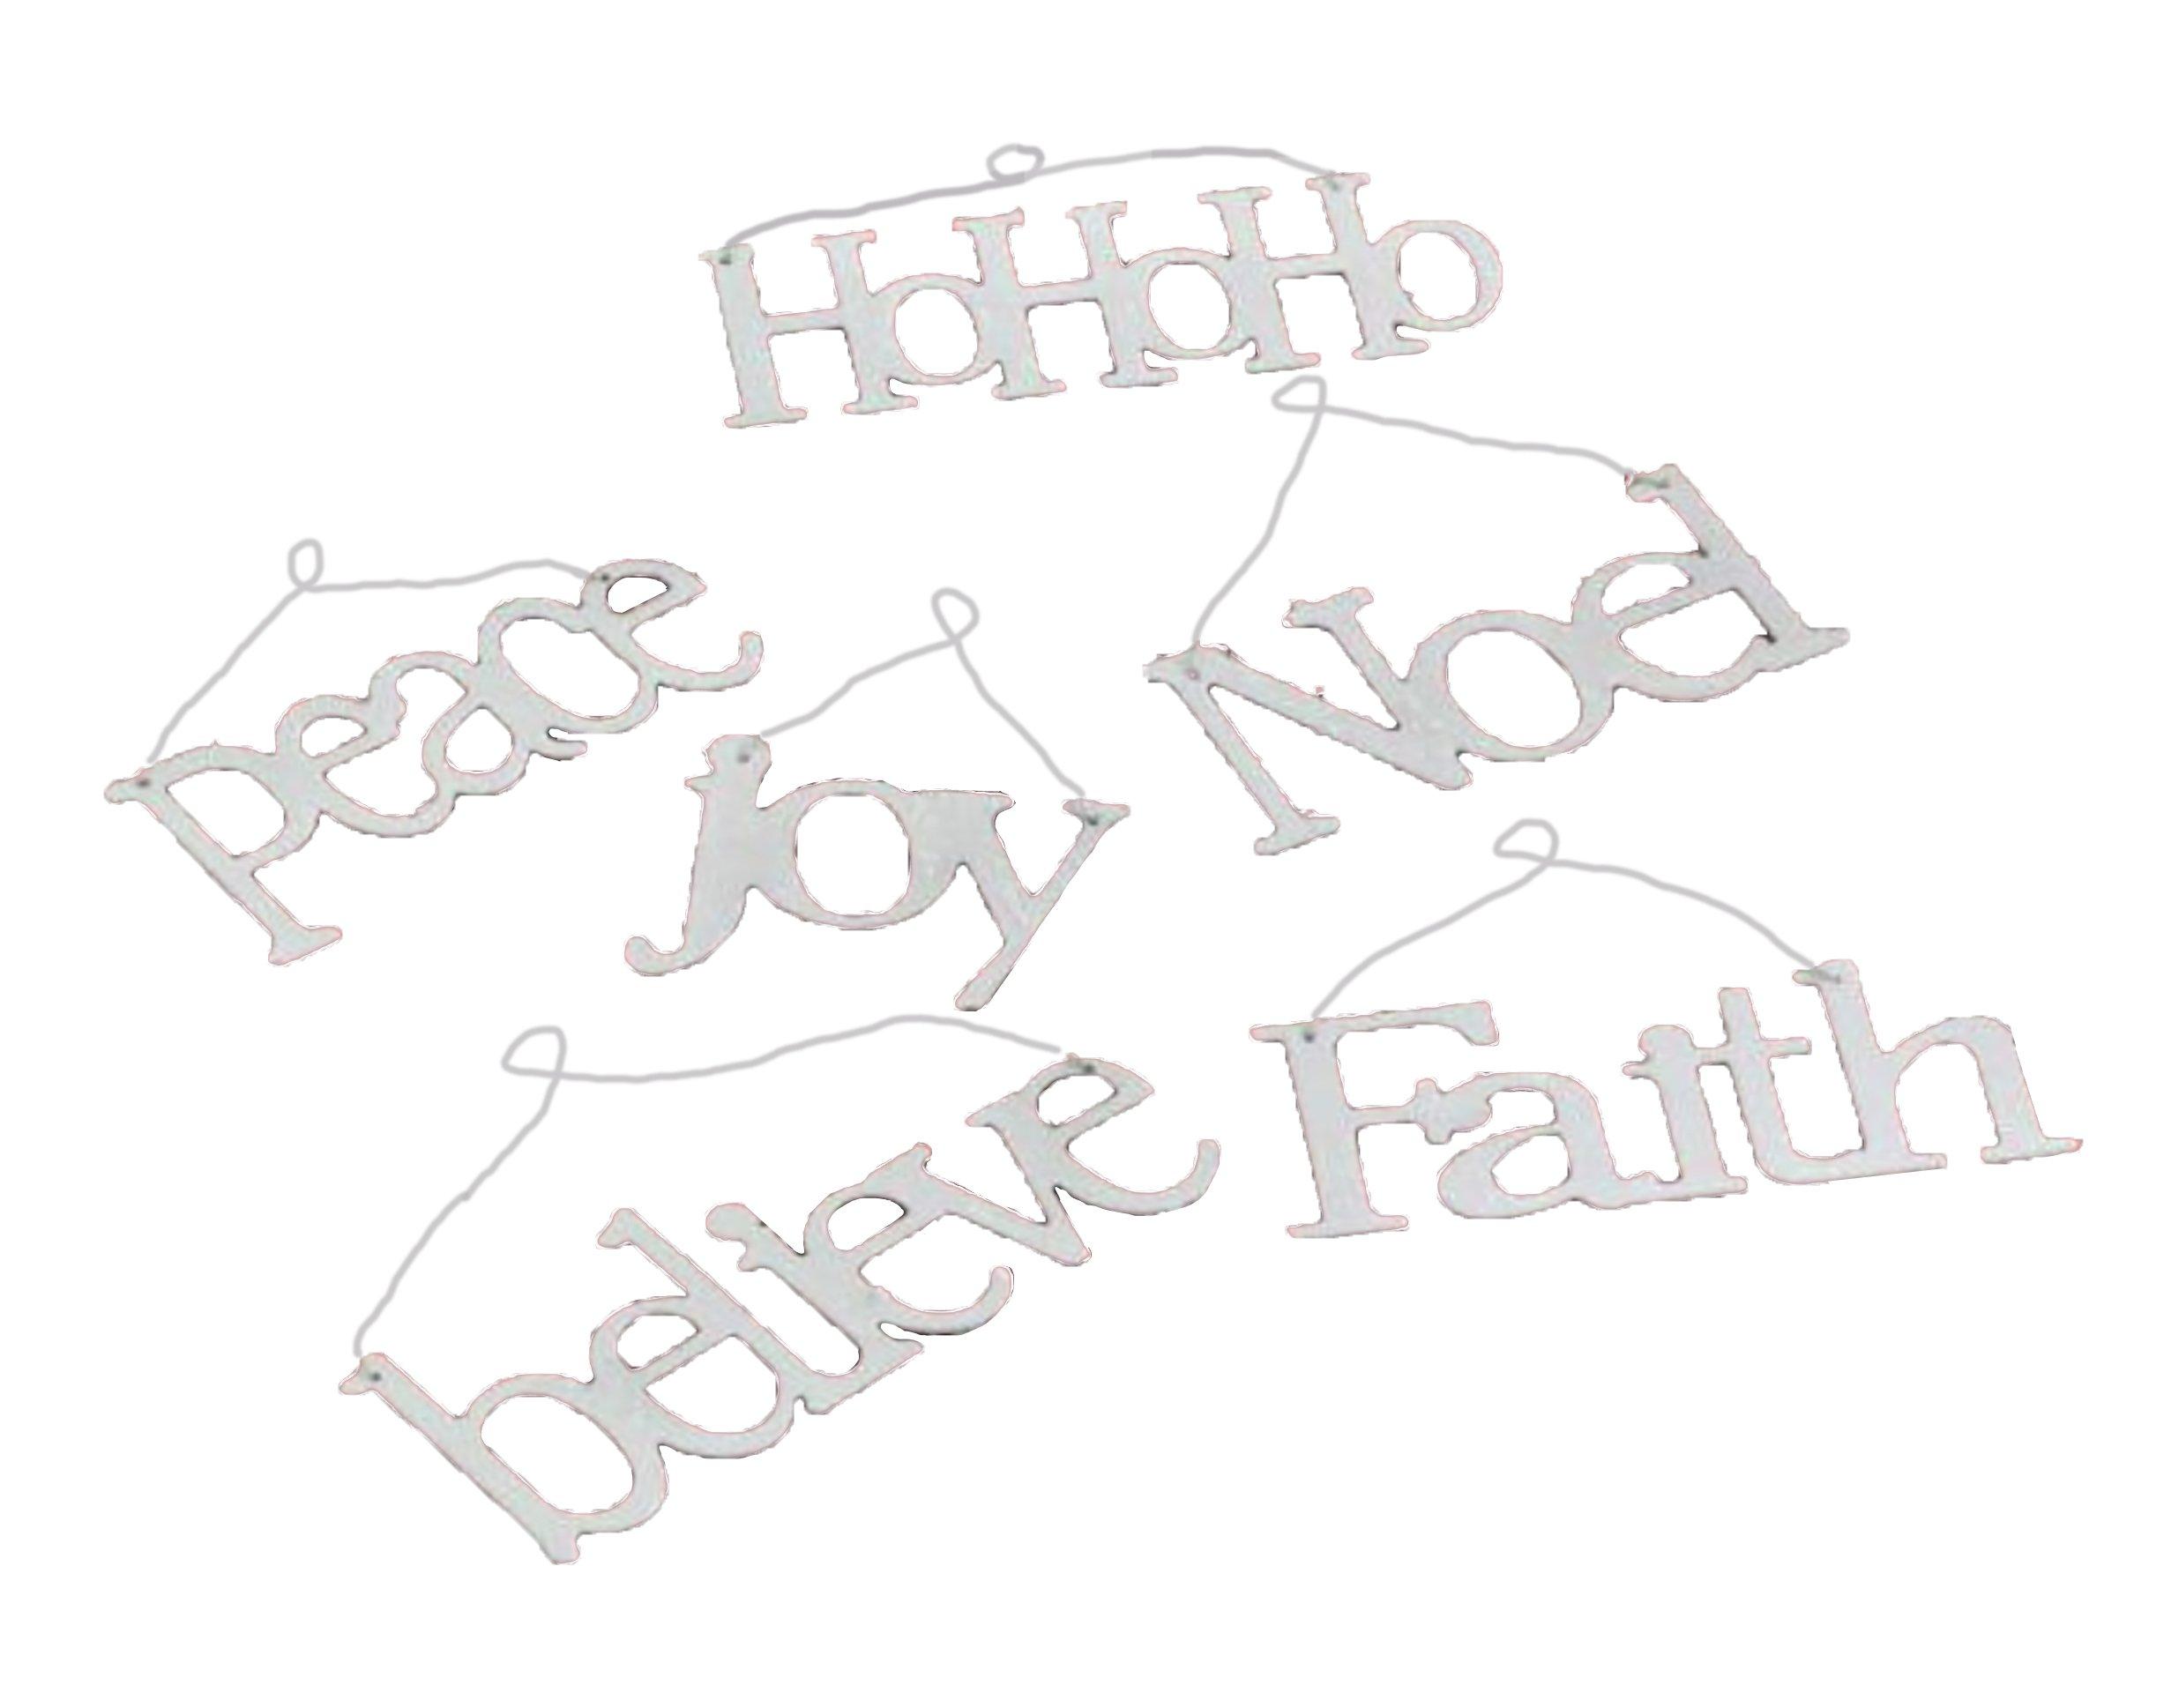 K&K Interiors Laser Cut Message Ornaments, Set of 6, Faith, Joy, Believe, Noel, Peace, HoHoHo (White)